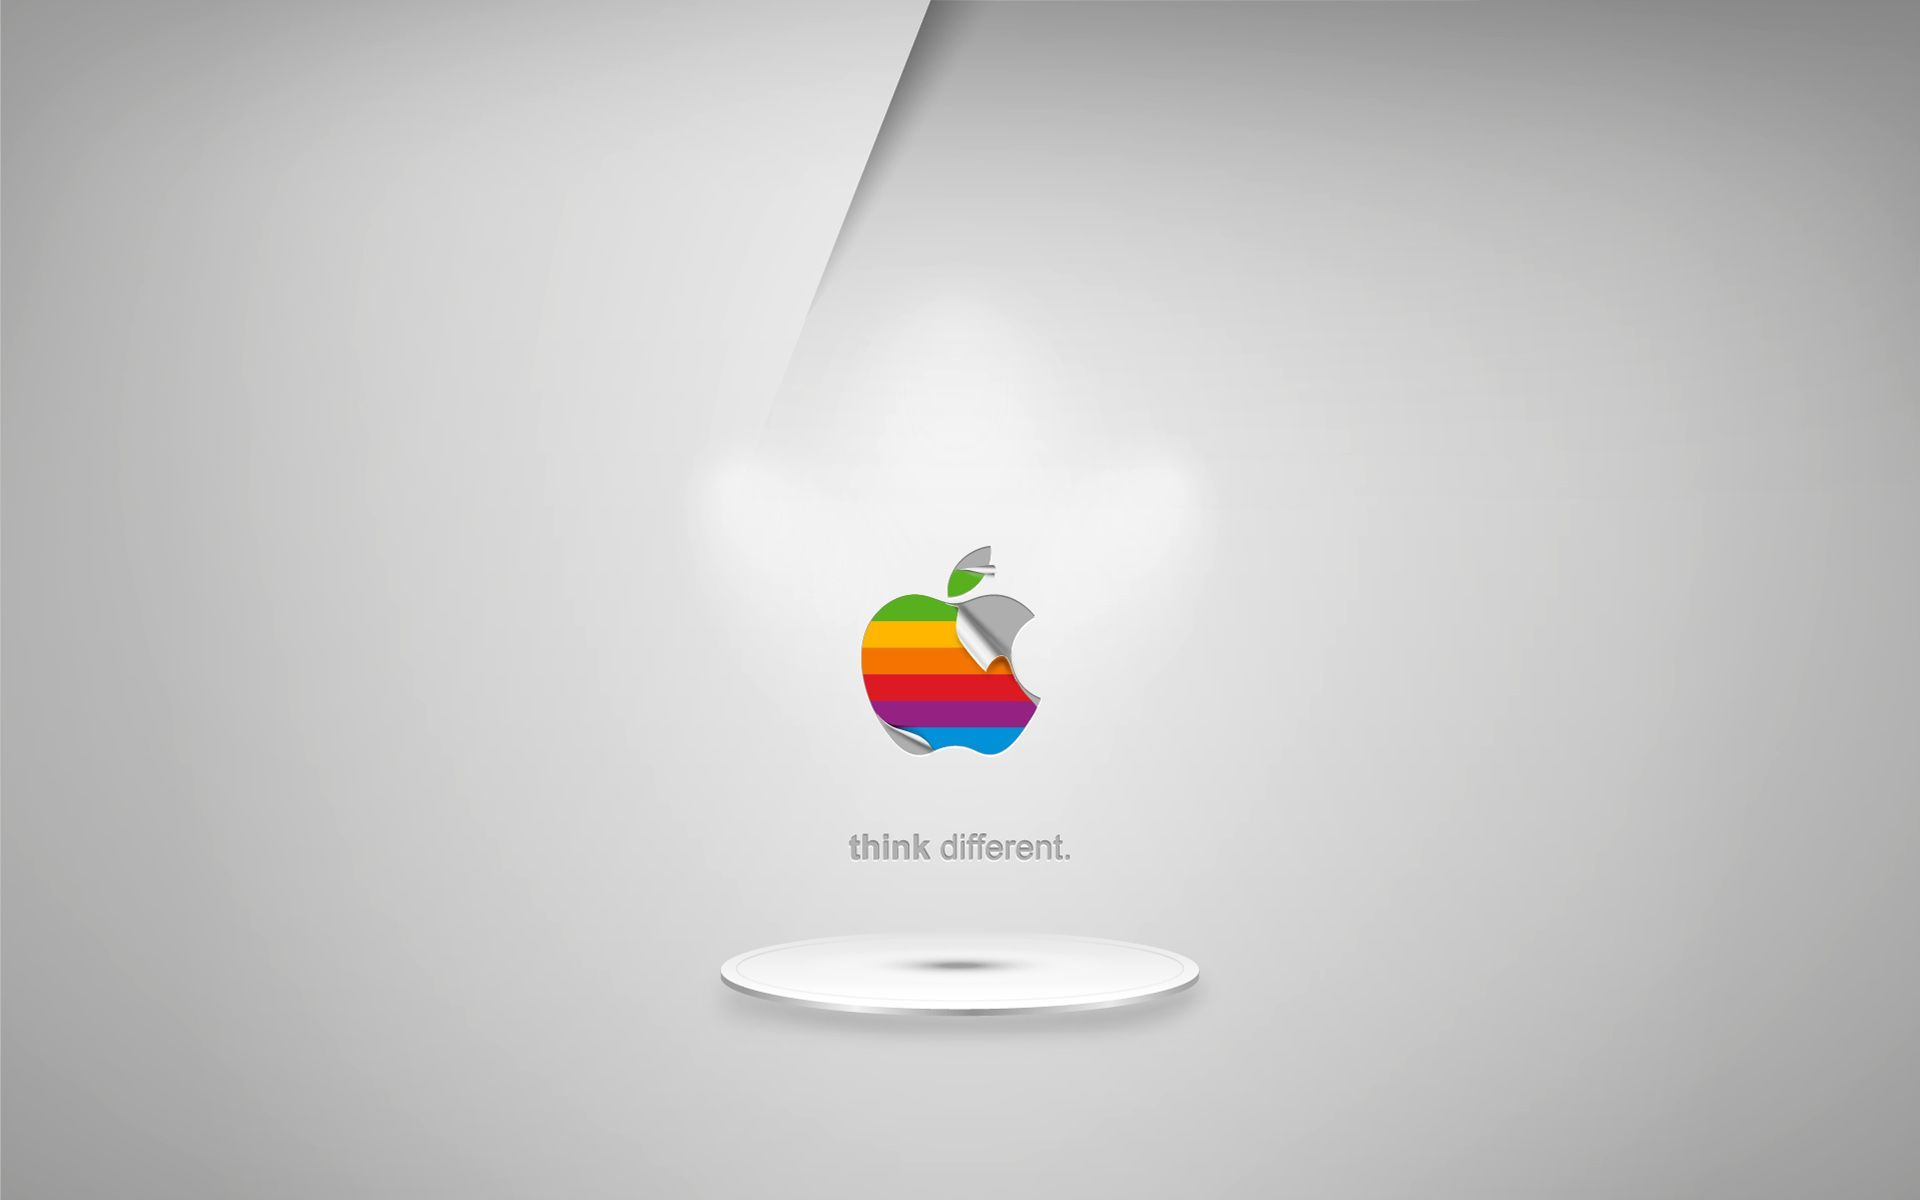 steve jobs think different apple mac desktop wallpaper apple | hd